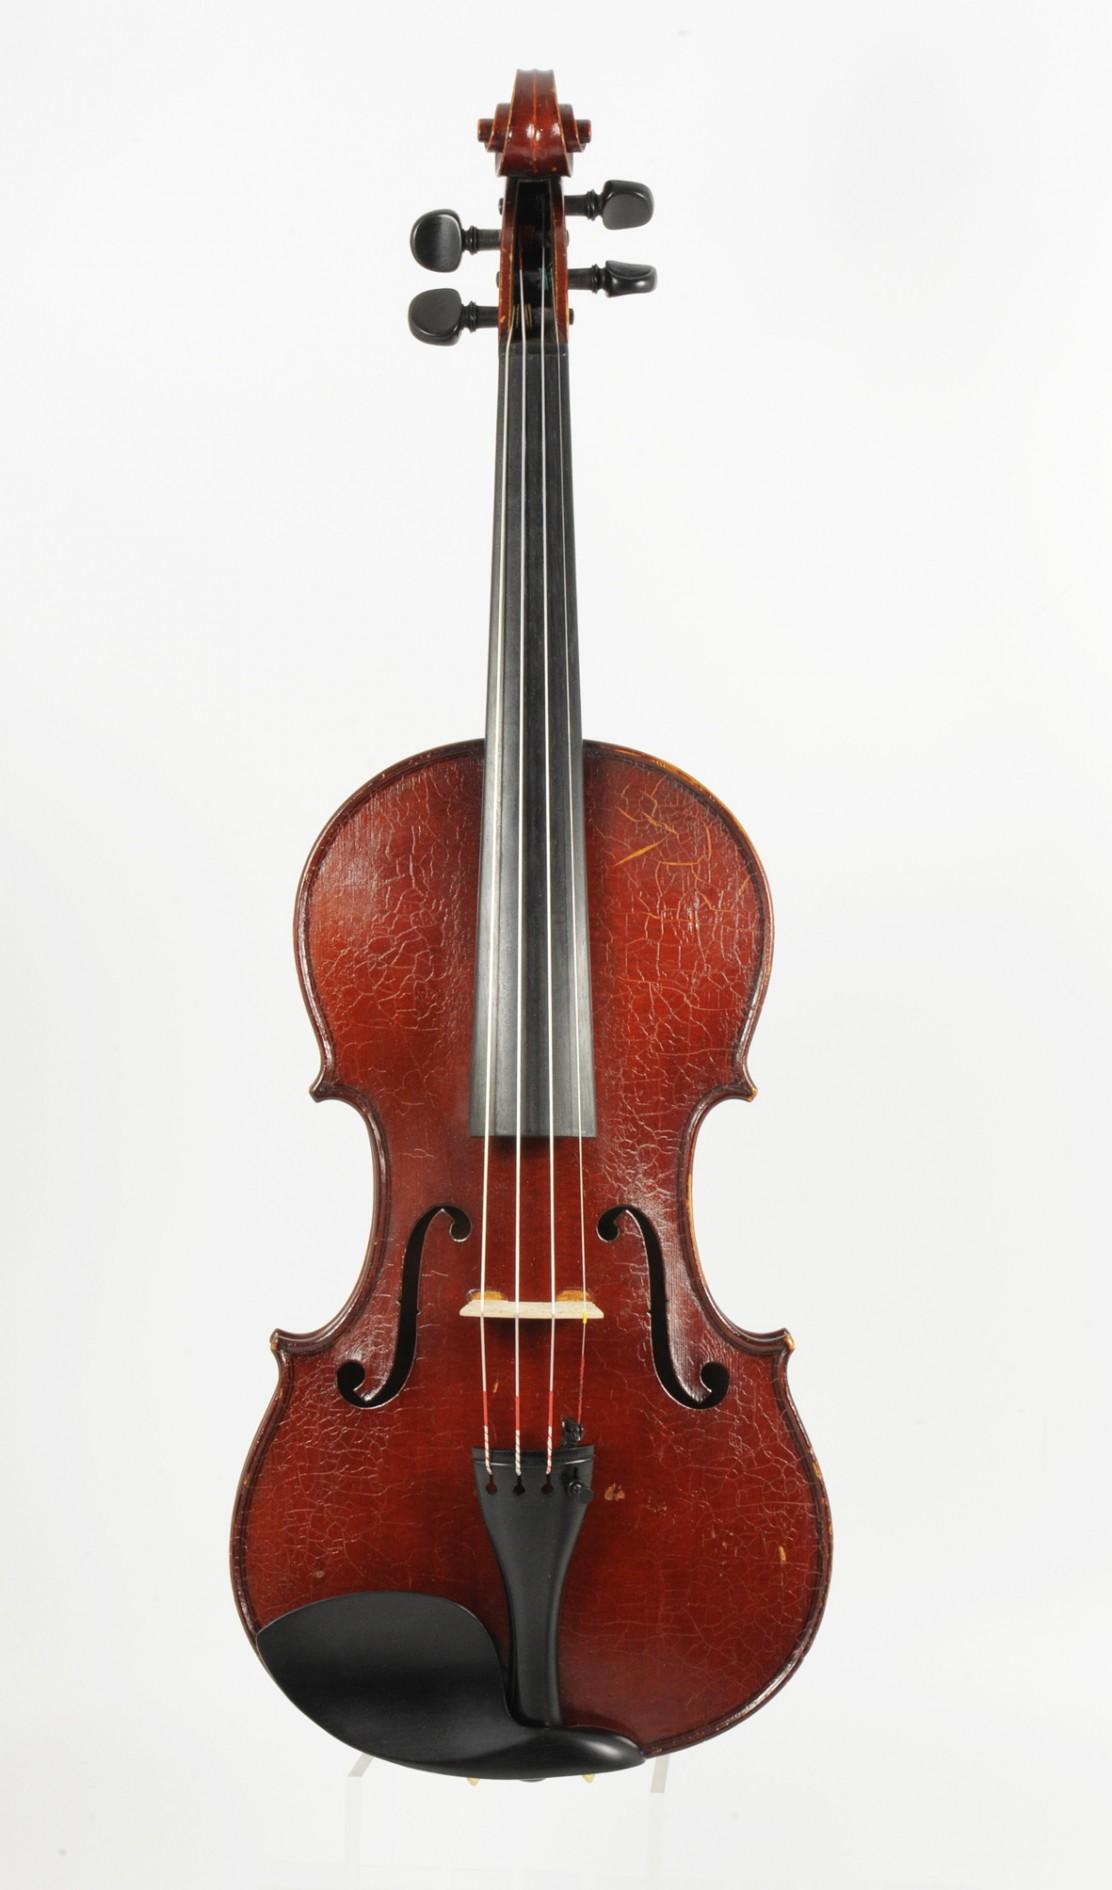 Rare old English violin, Ch. Heinrich - top